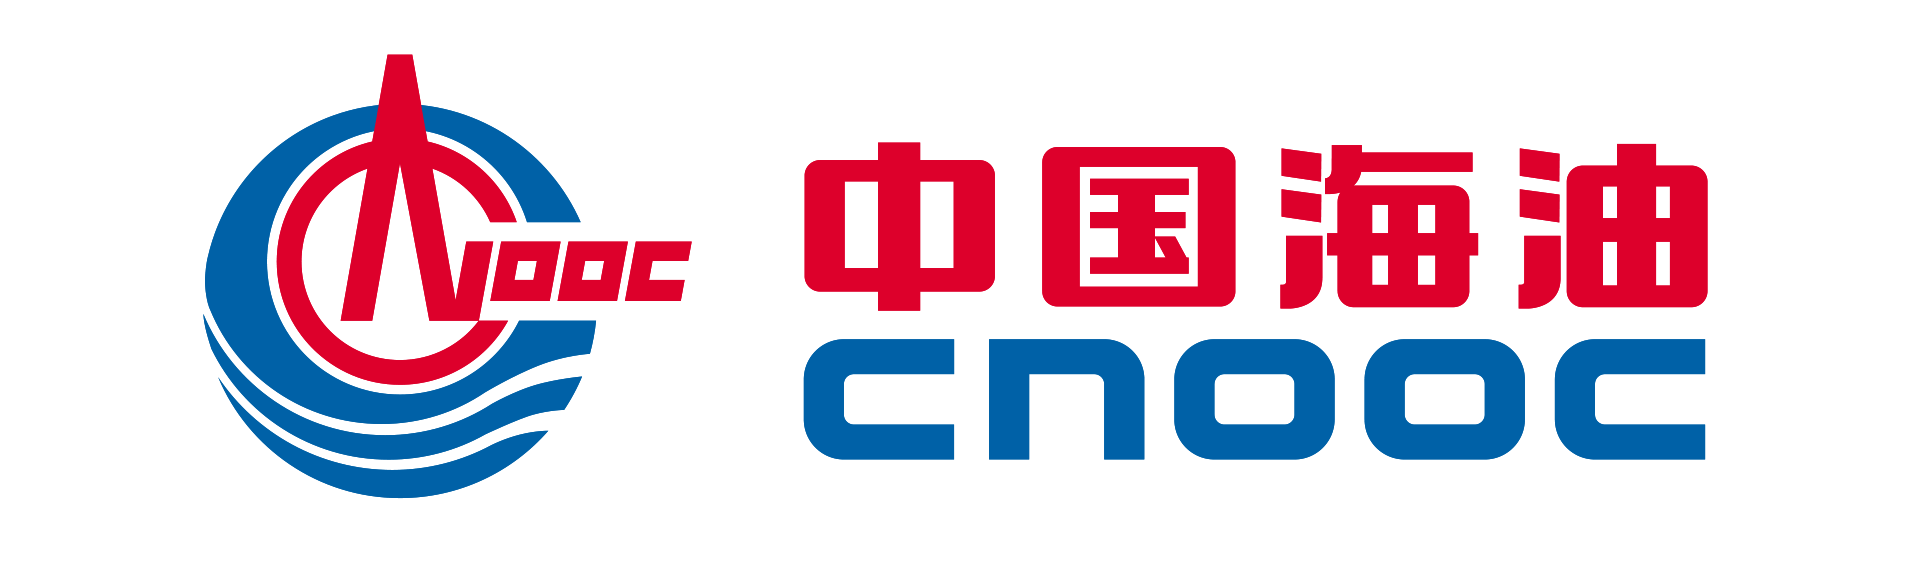 Cnooc 883 Icon Logo